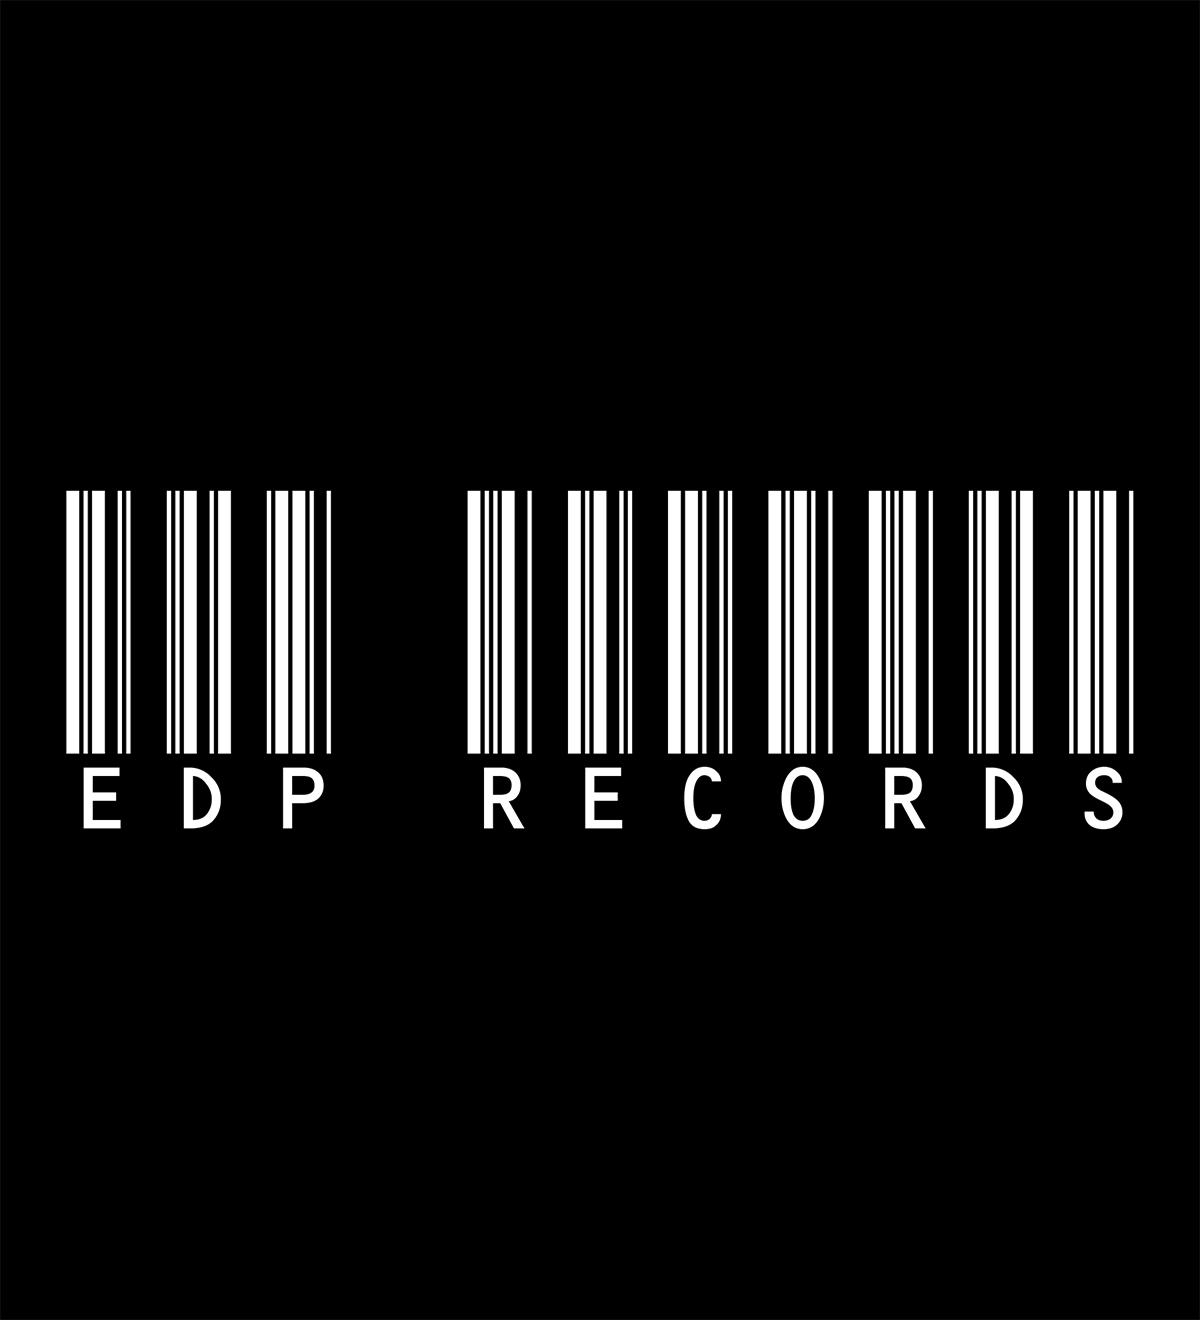 EDP Records Barcode White